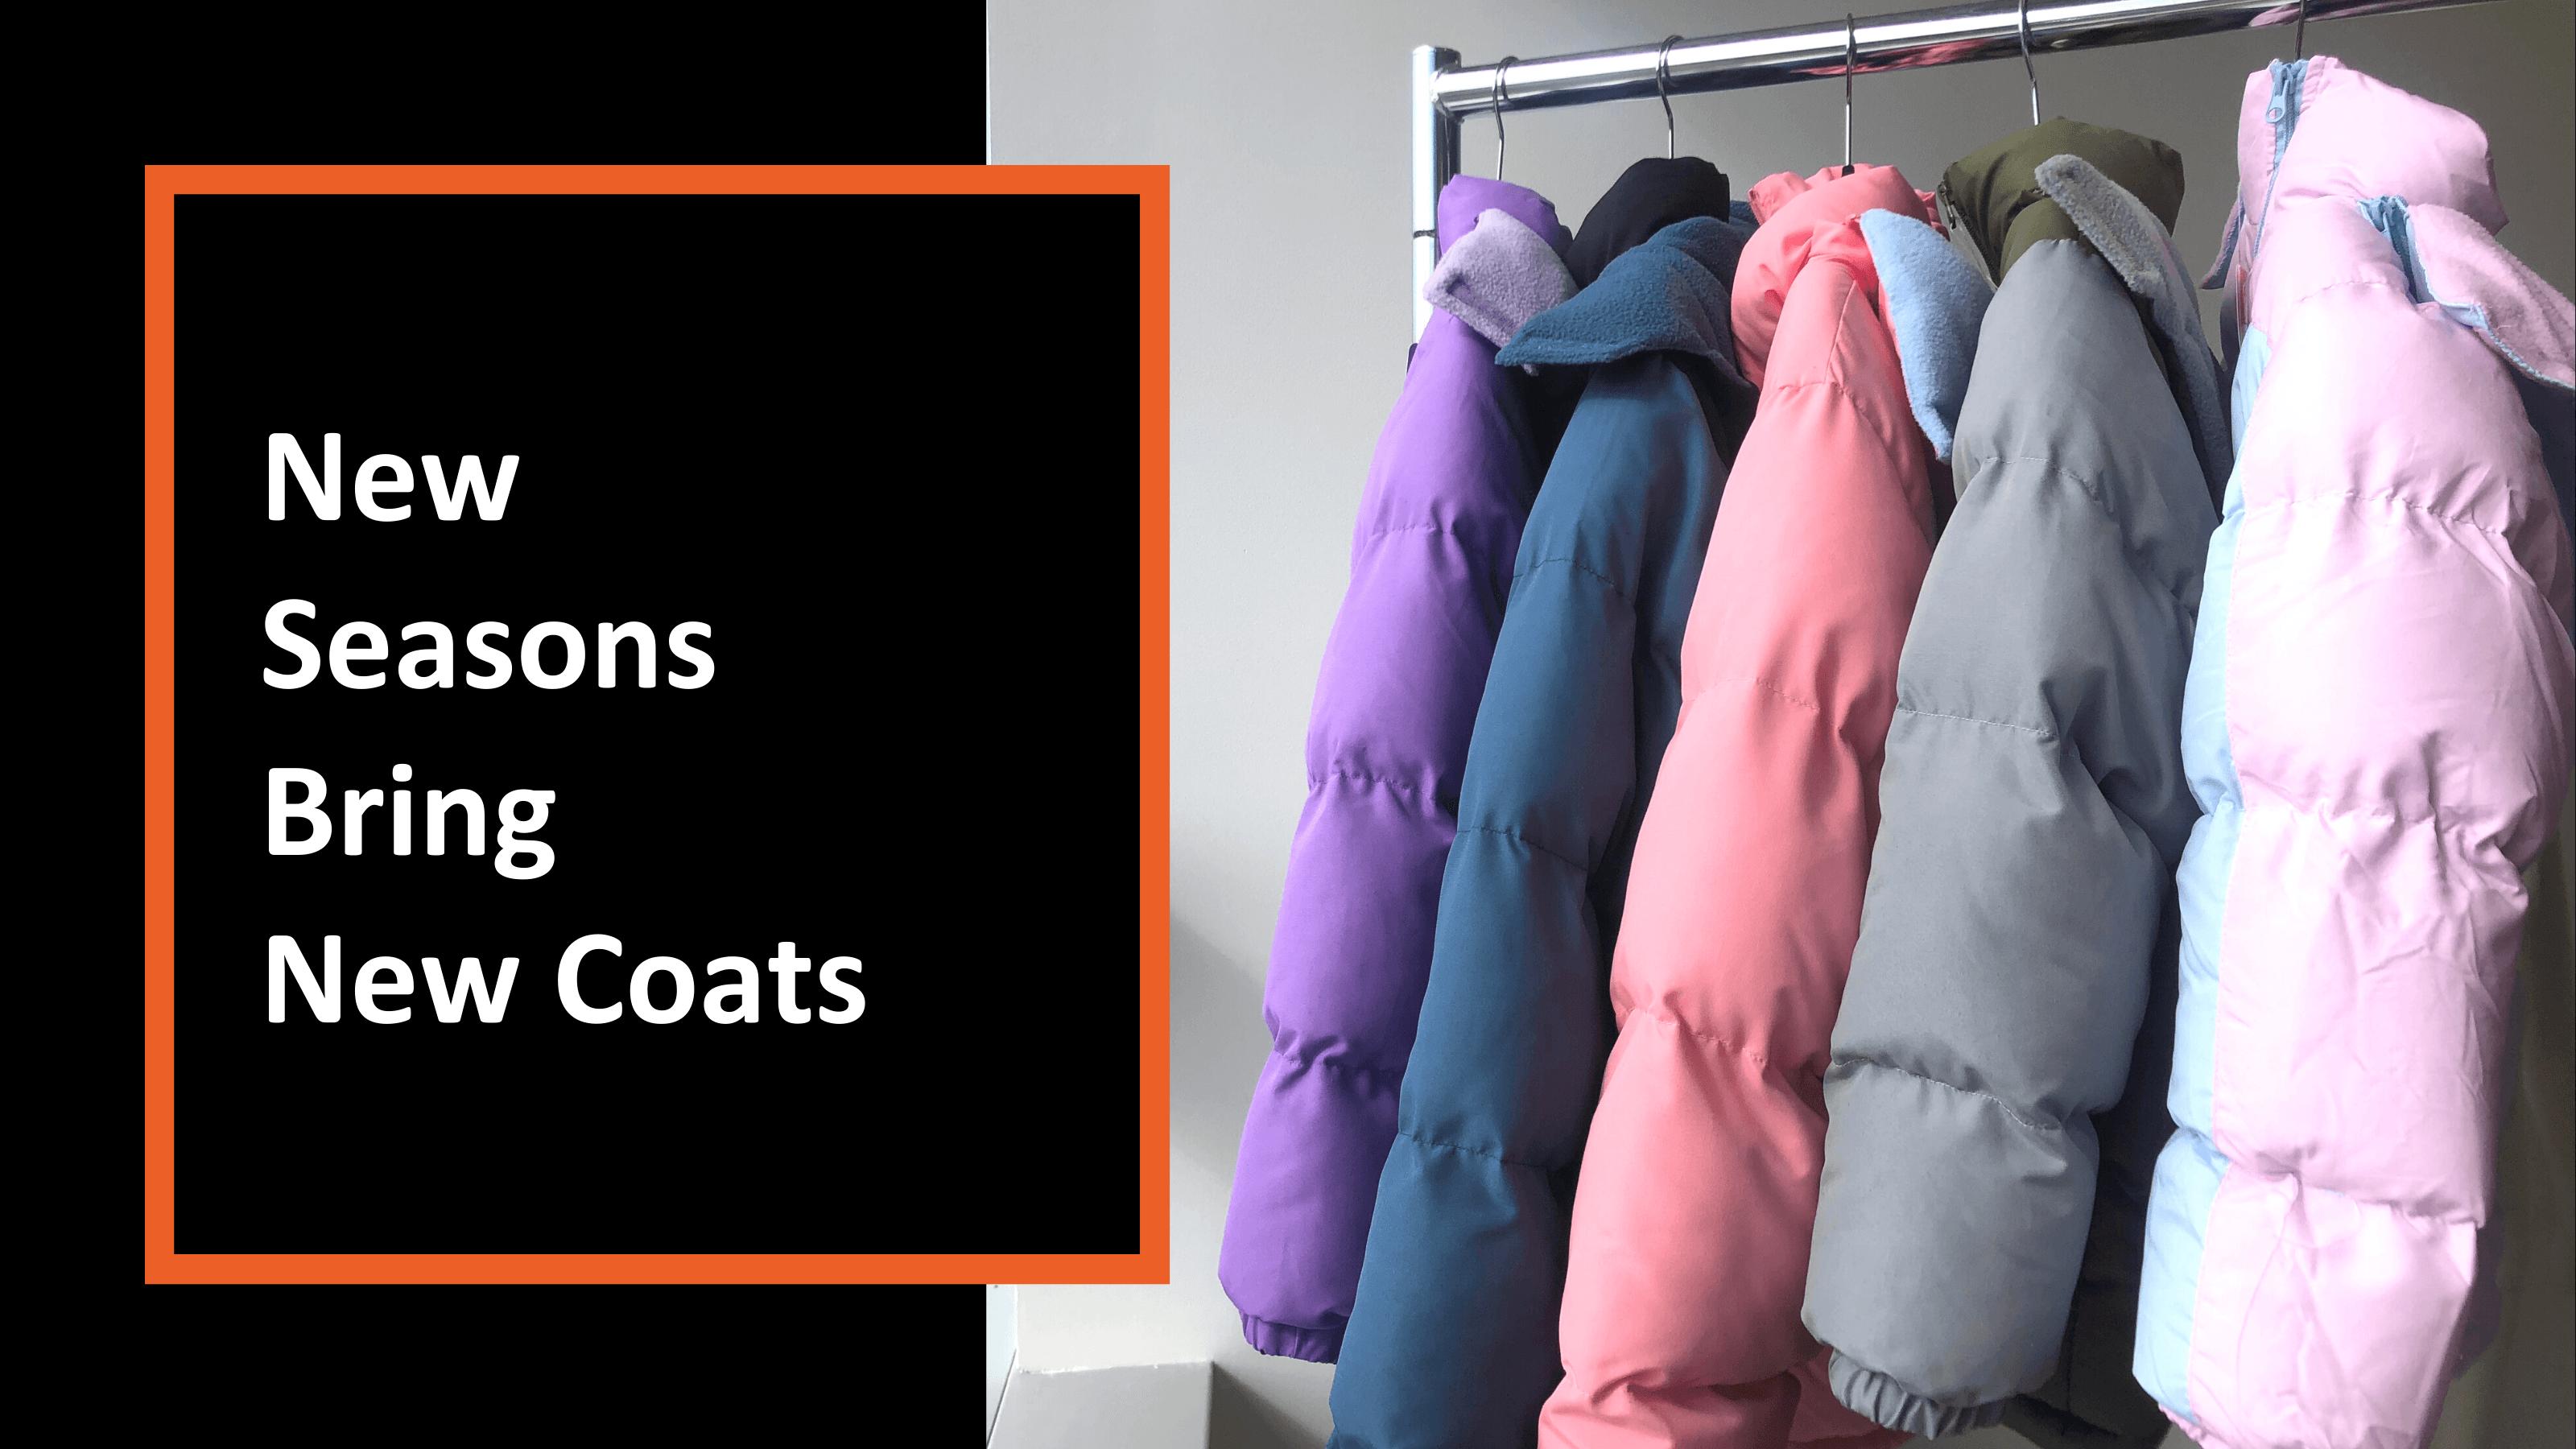 New Seasons Bring New Coats